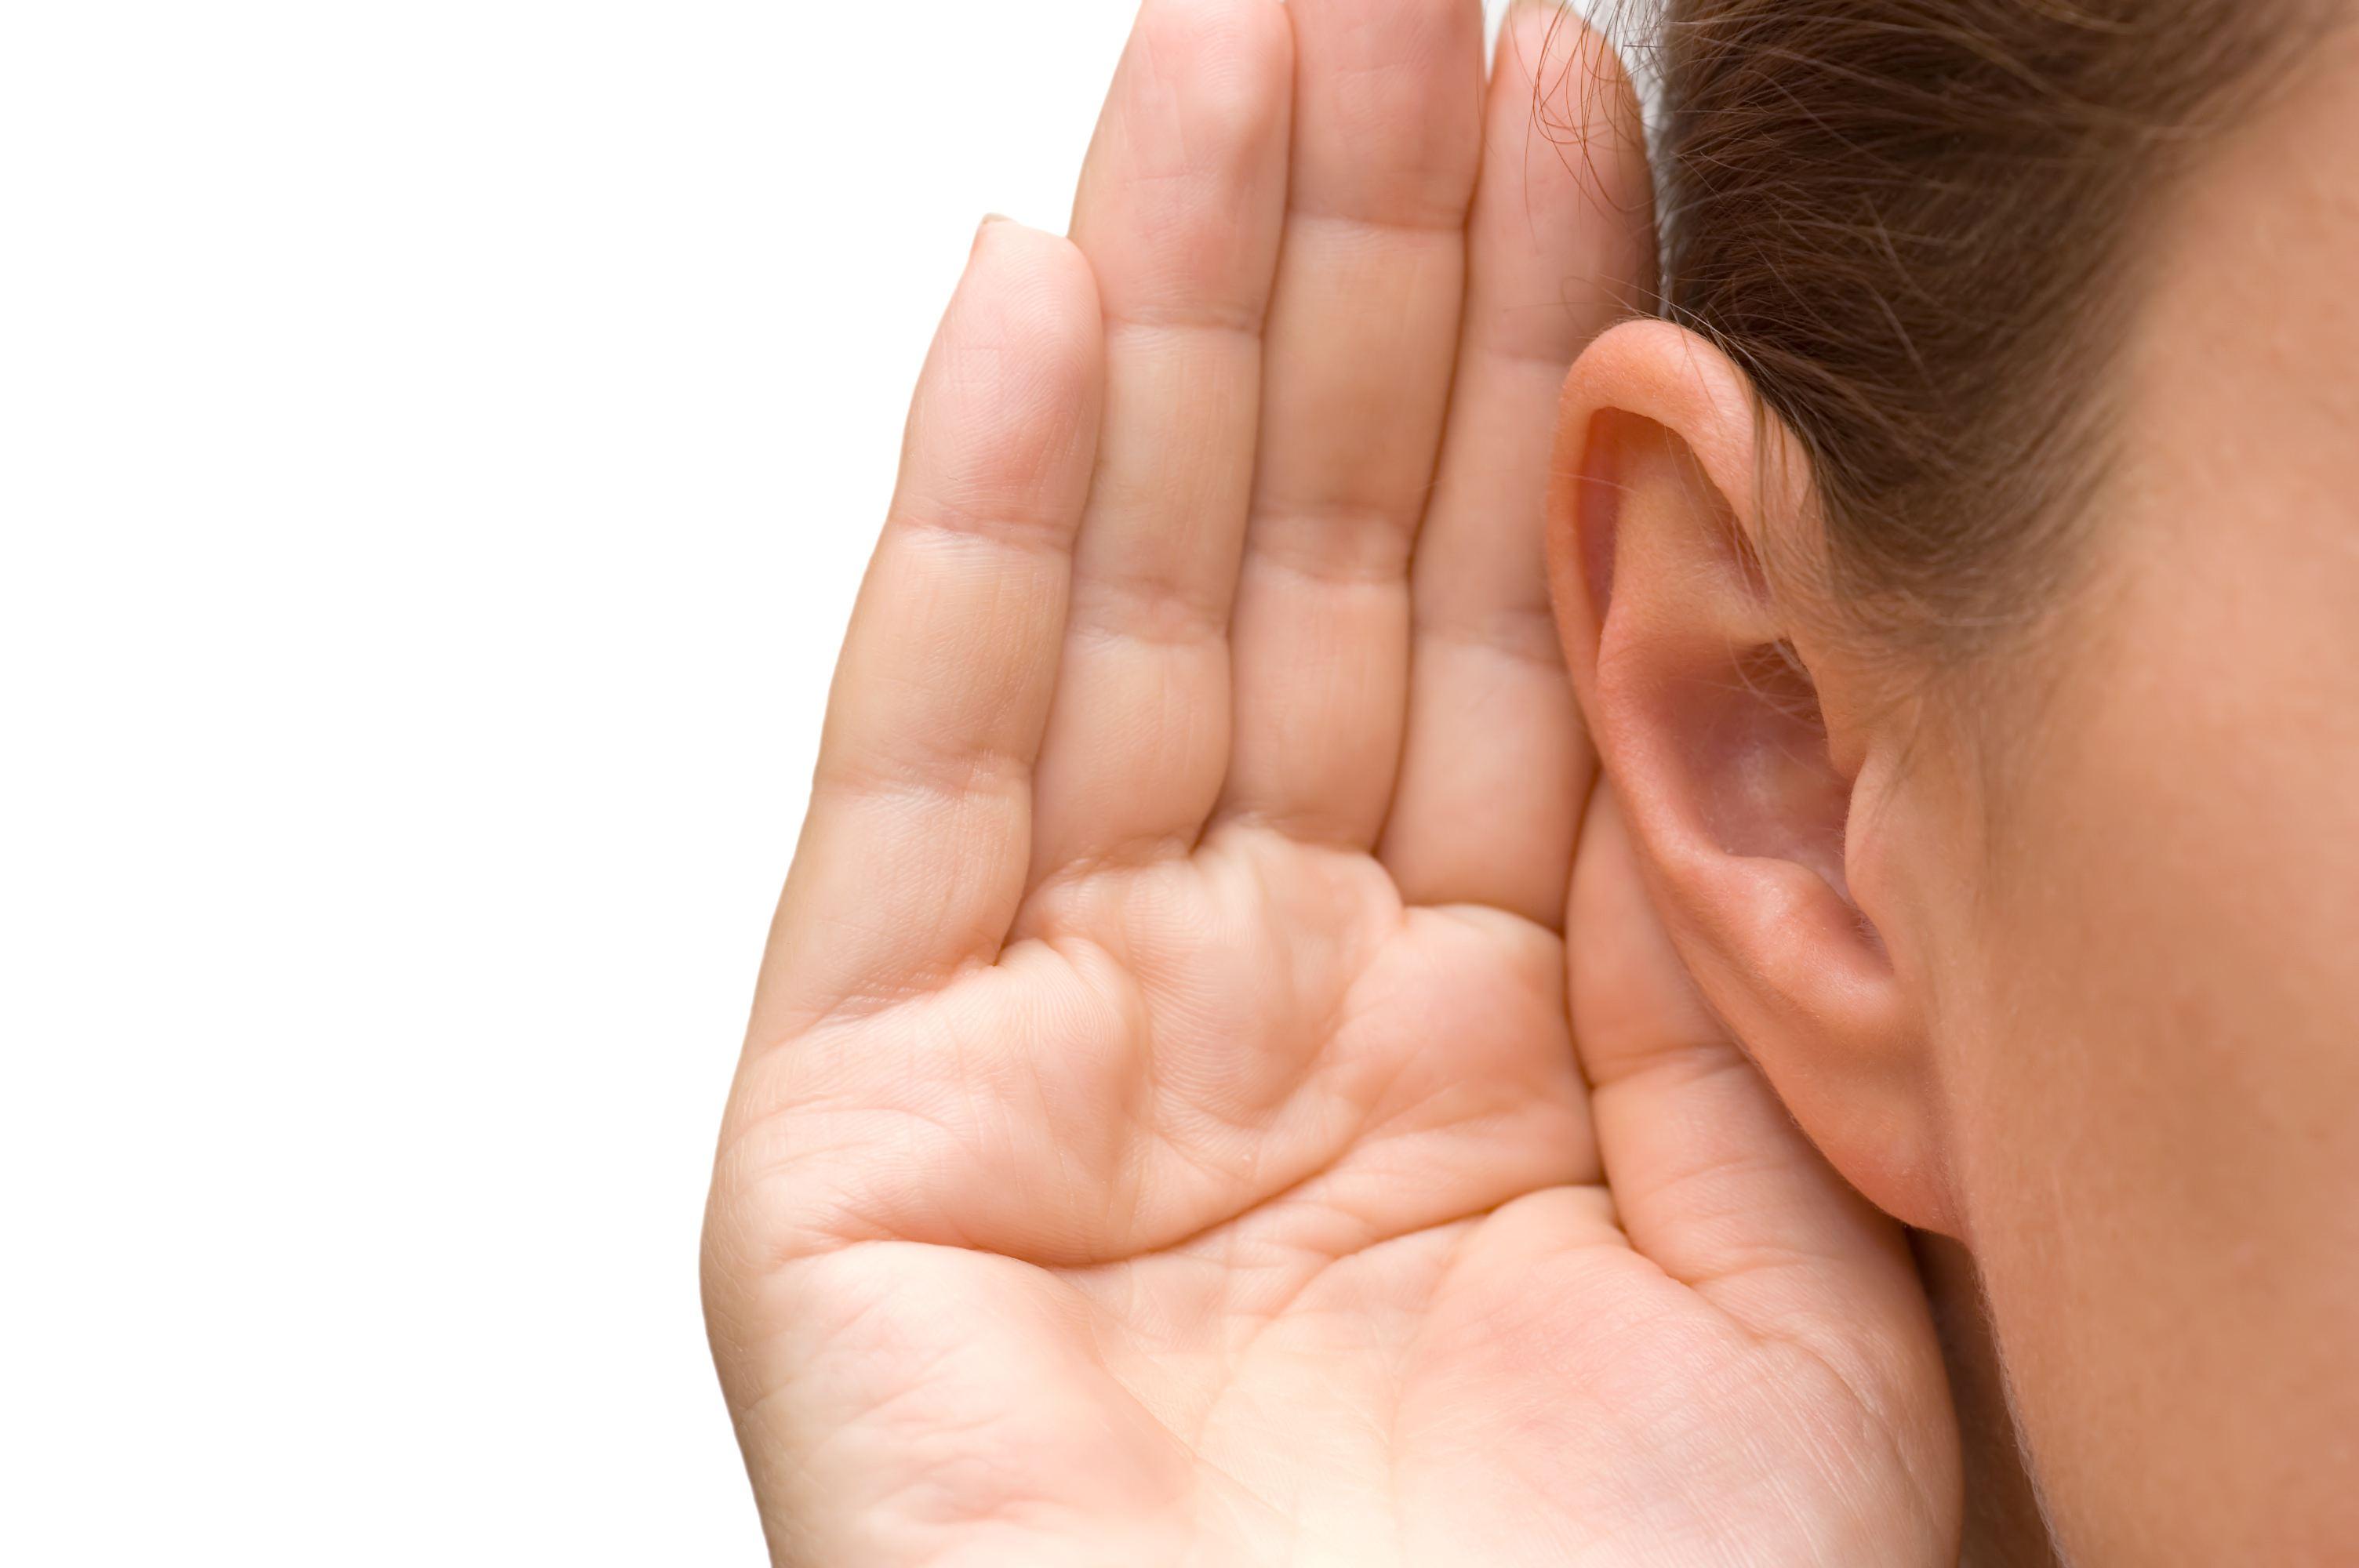 hipertenzija ir ausies užgulimas